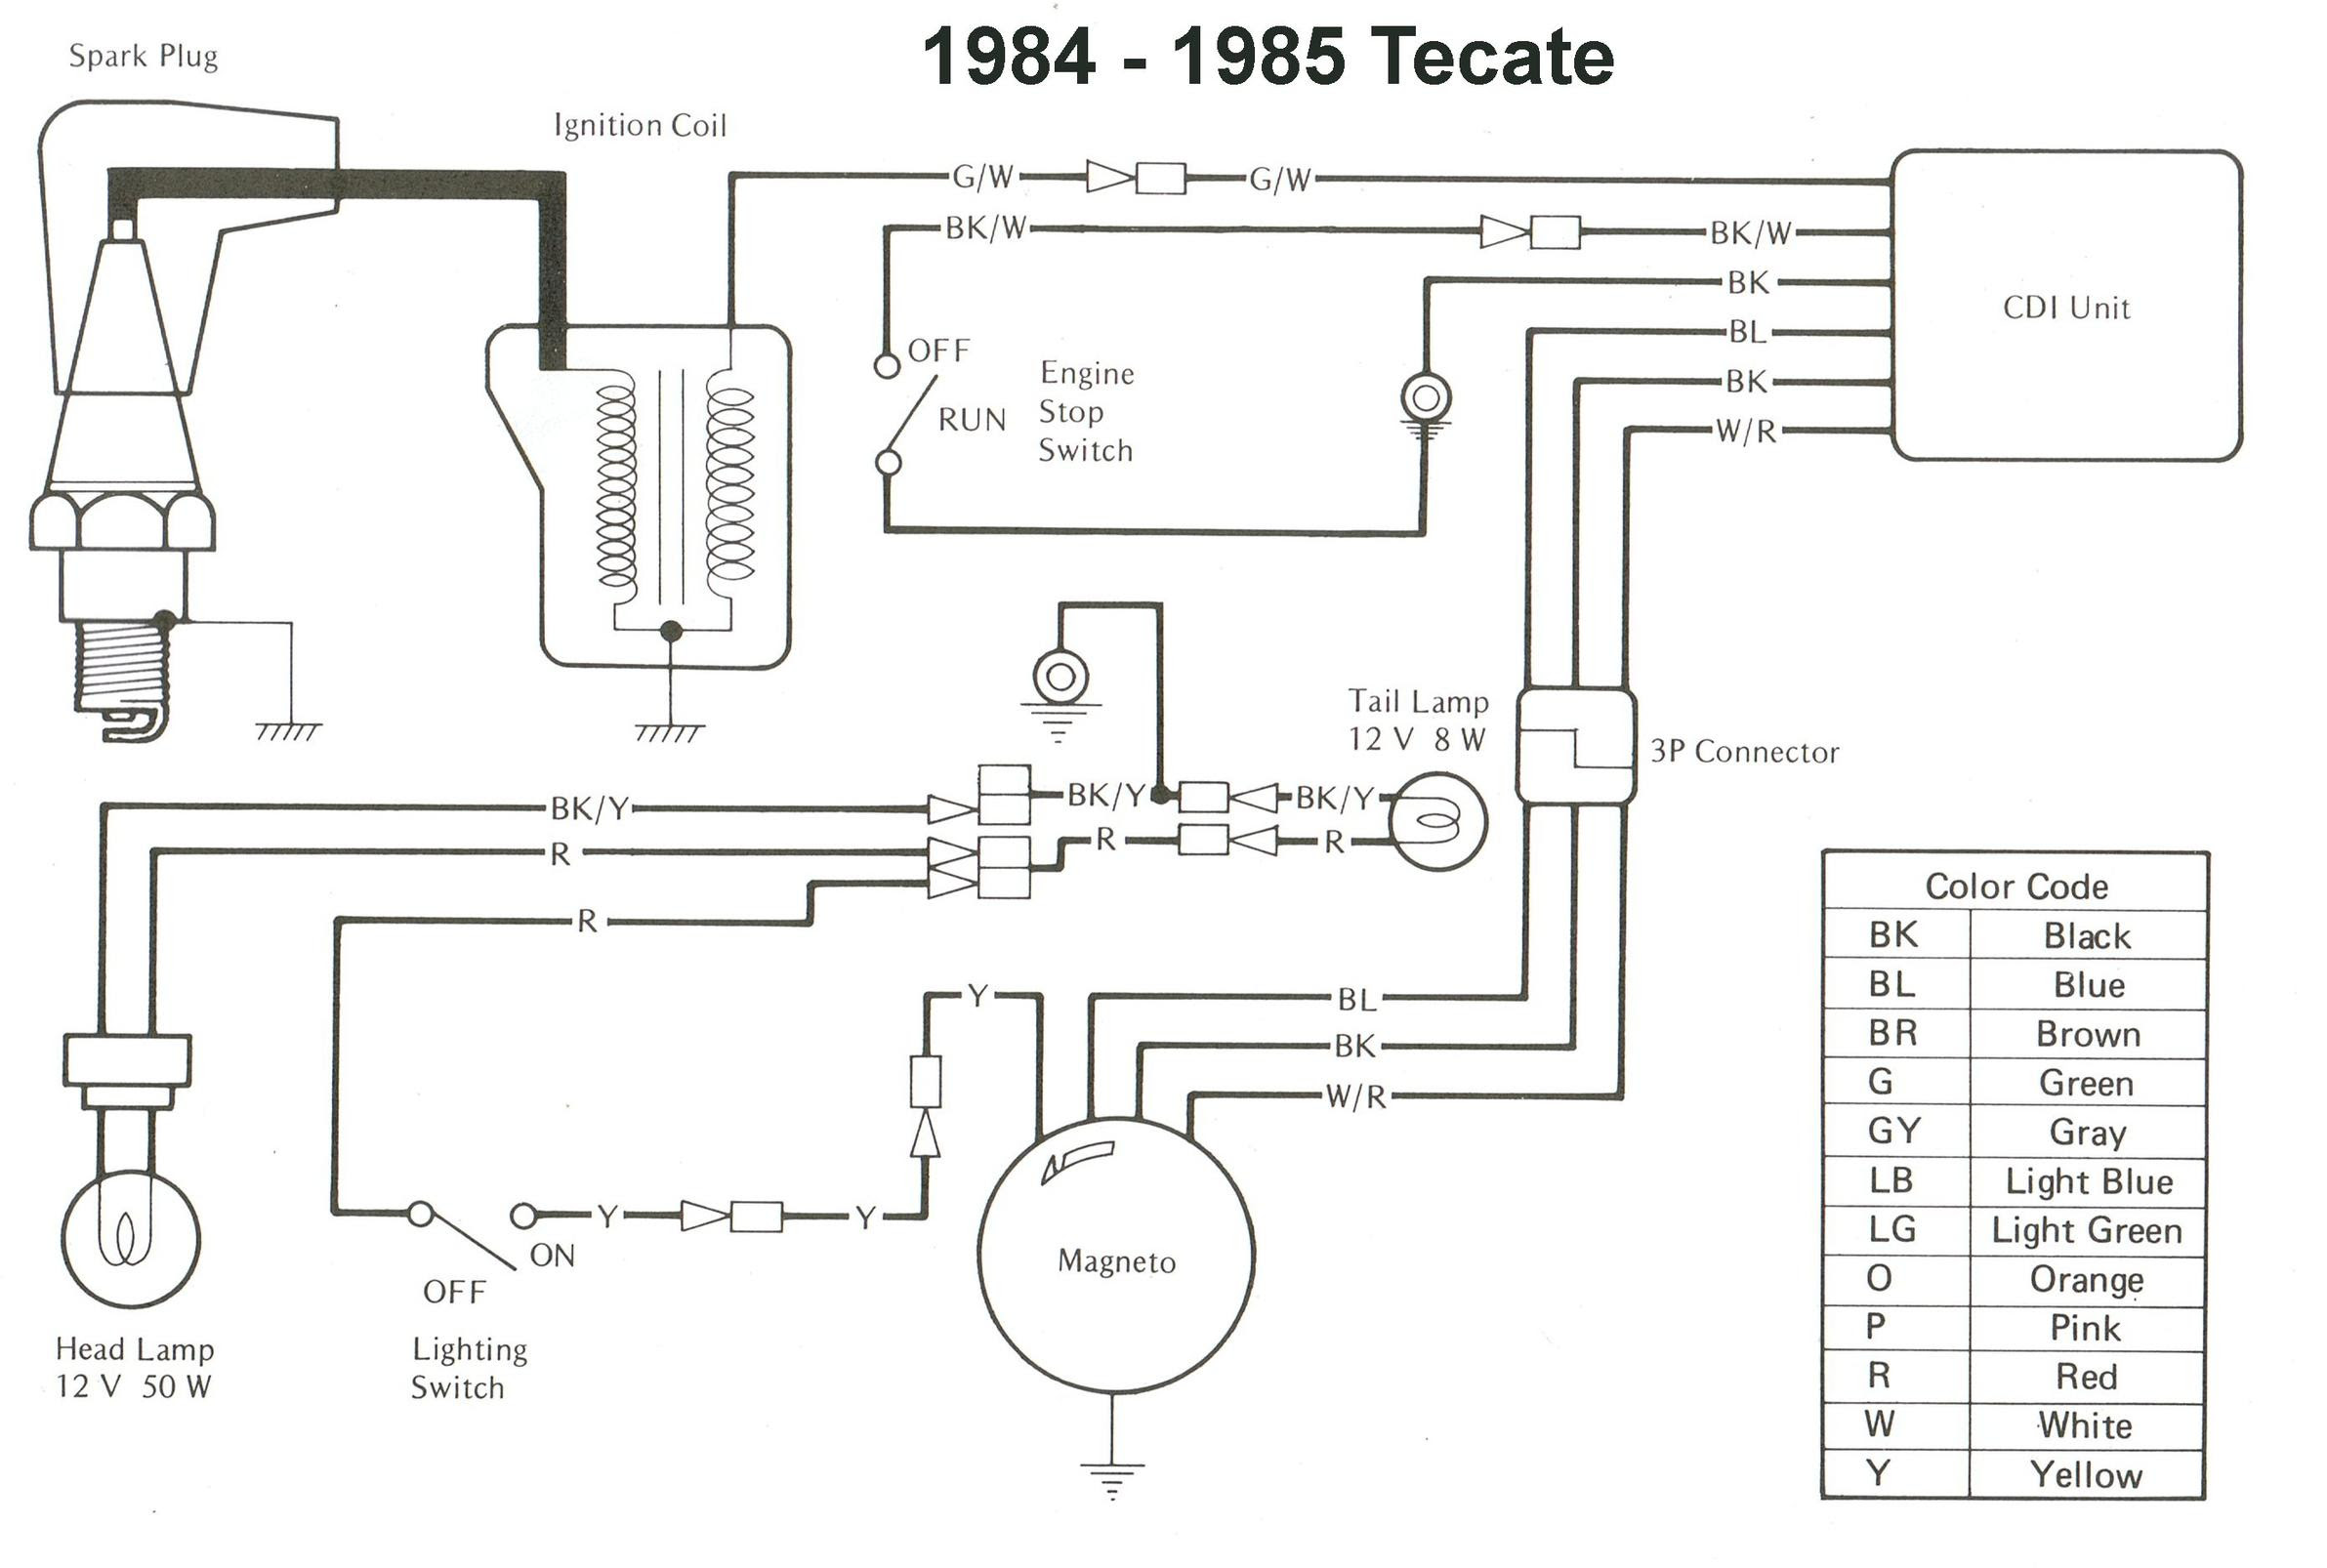 1986 Kawasaki 250 Wiring Diagram Free Picture Wiring Diagrams Name Name Miglioribanche It